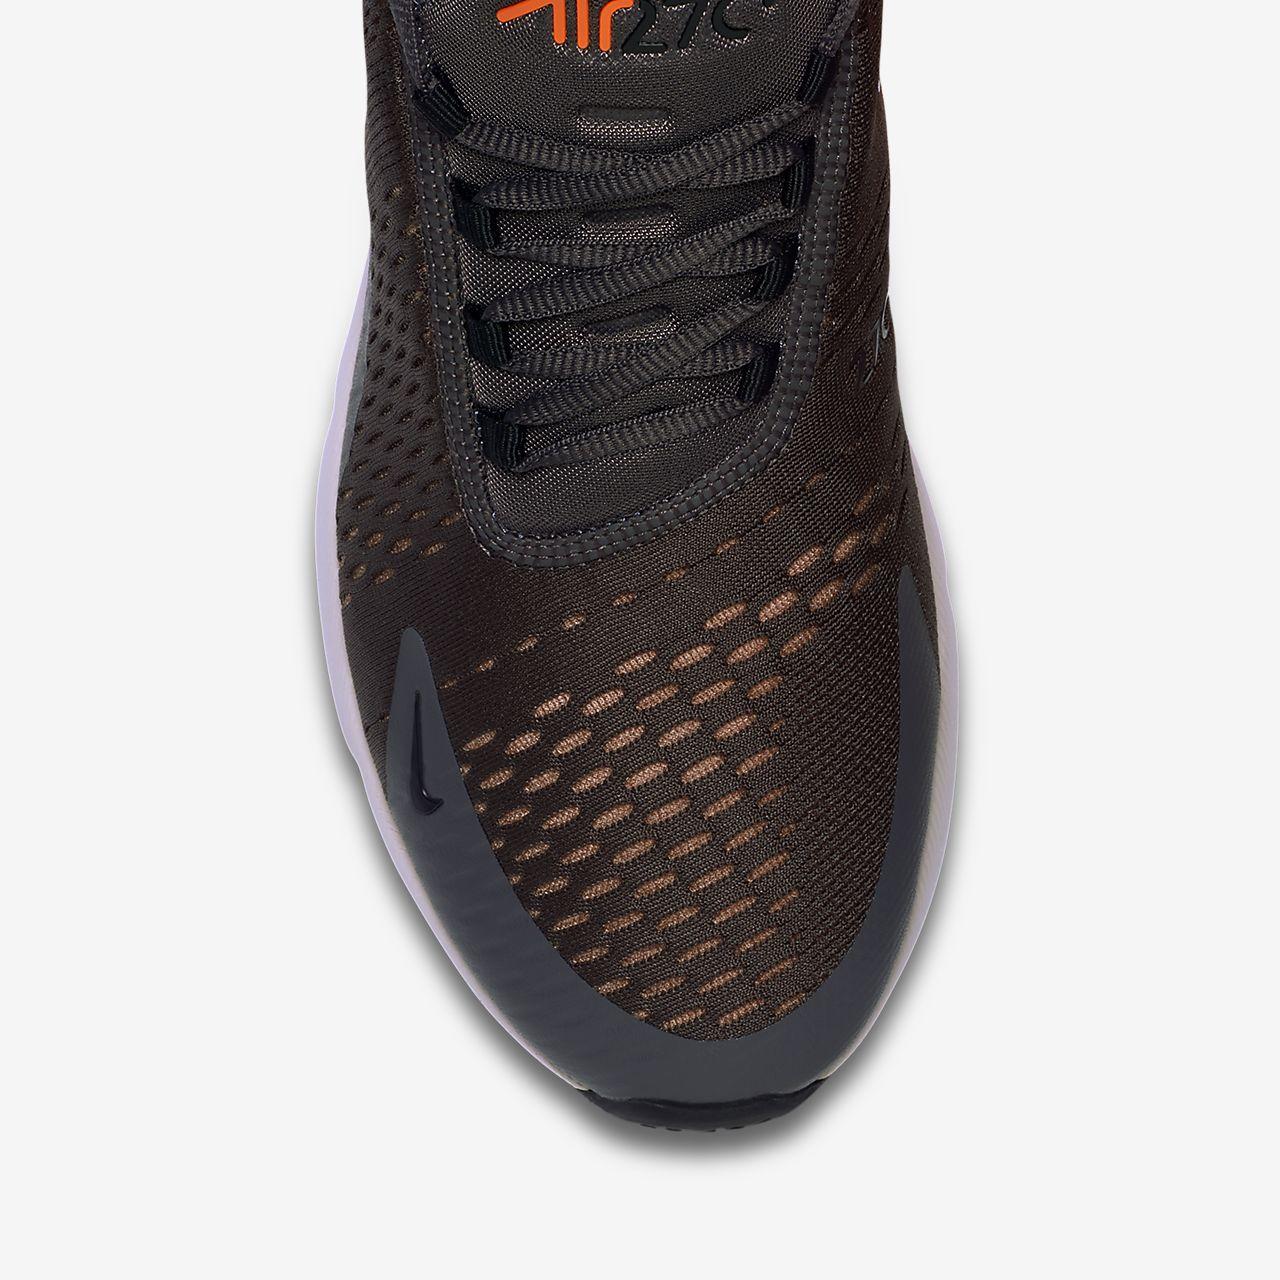 fashion super cheap on wholesale Nike Air Max 270 Herrenschuh